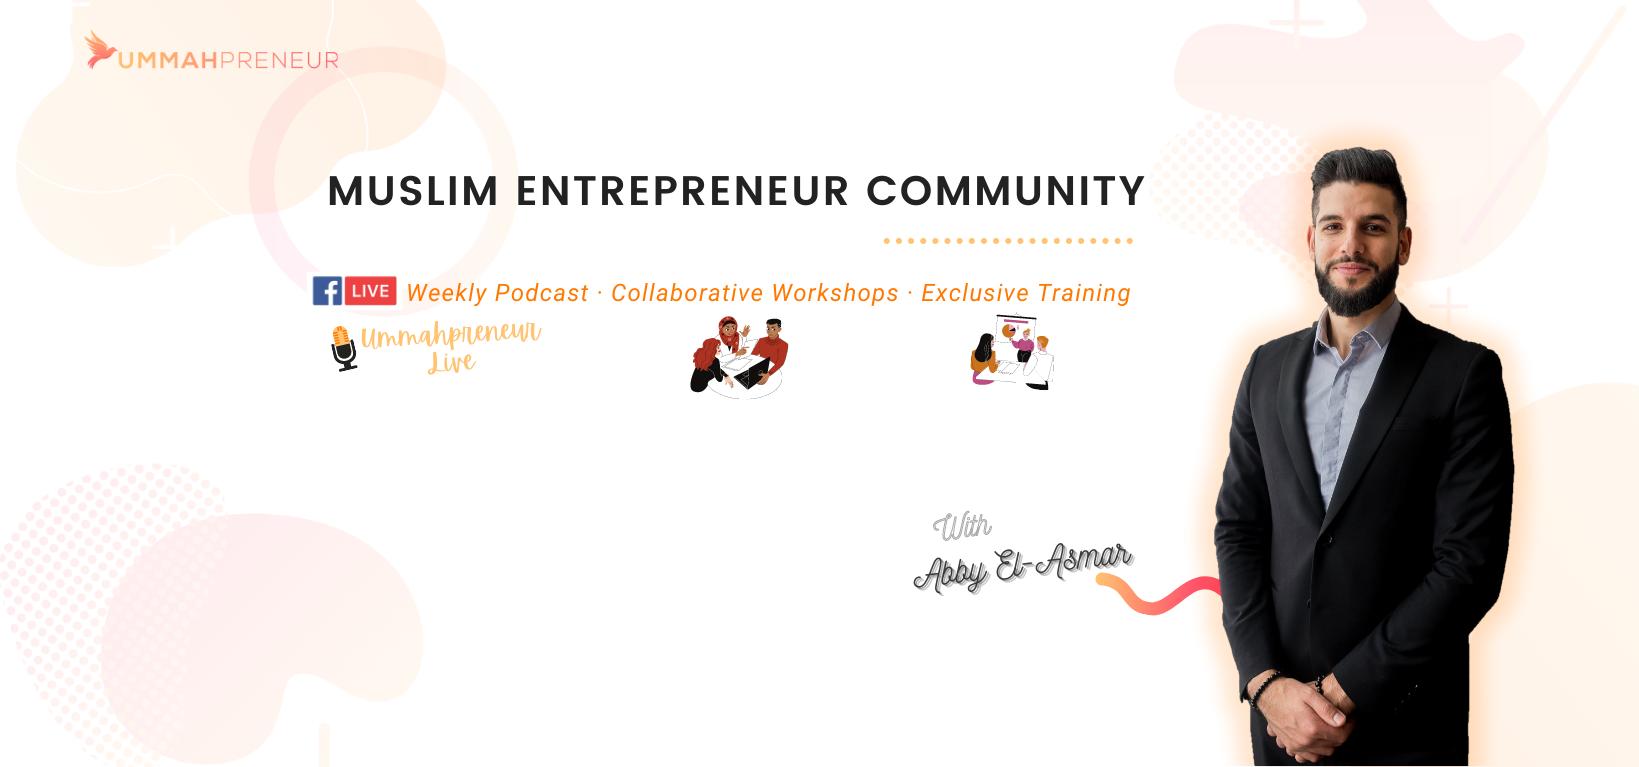 Ummahpreneur - Muslim Entrepreneur Community